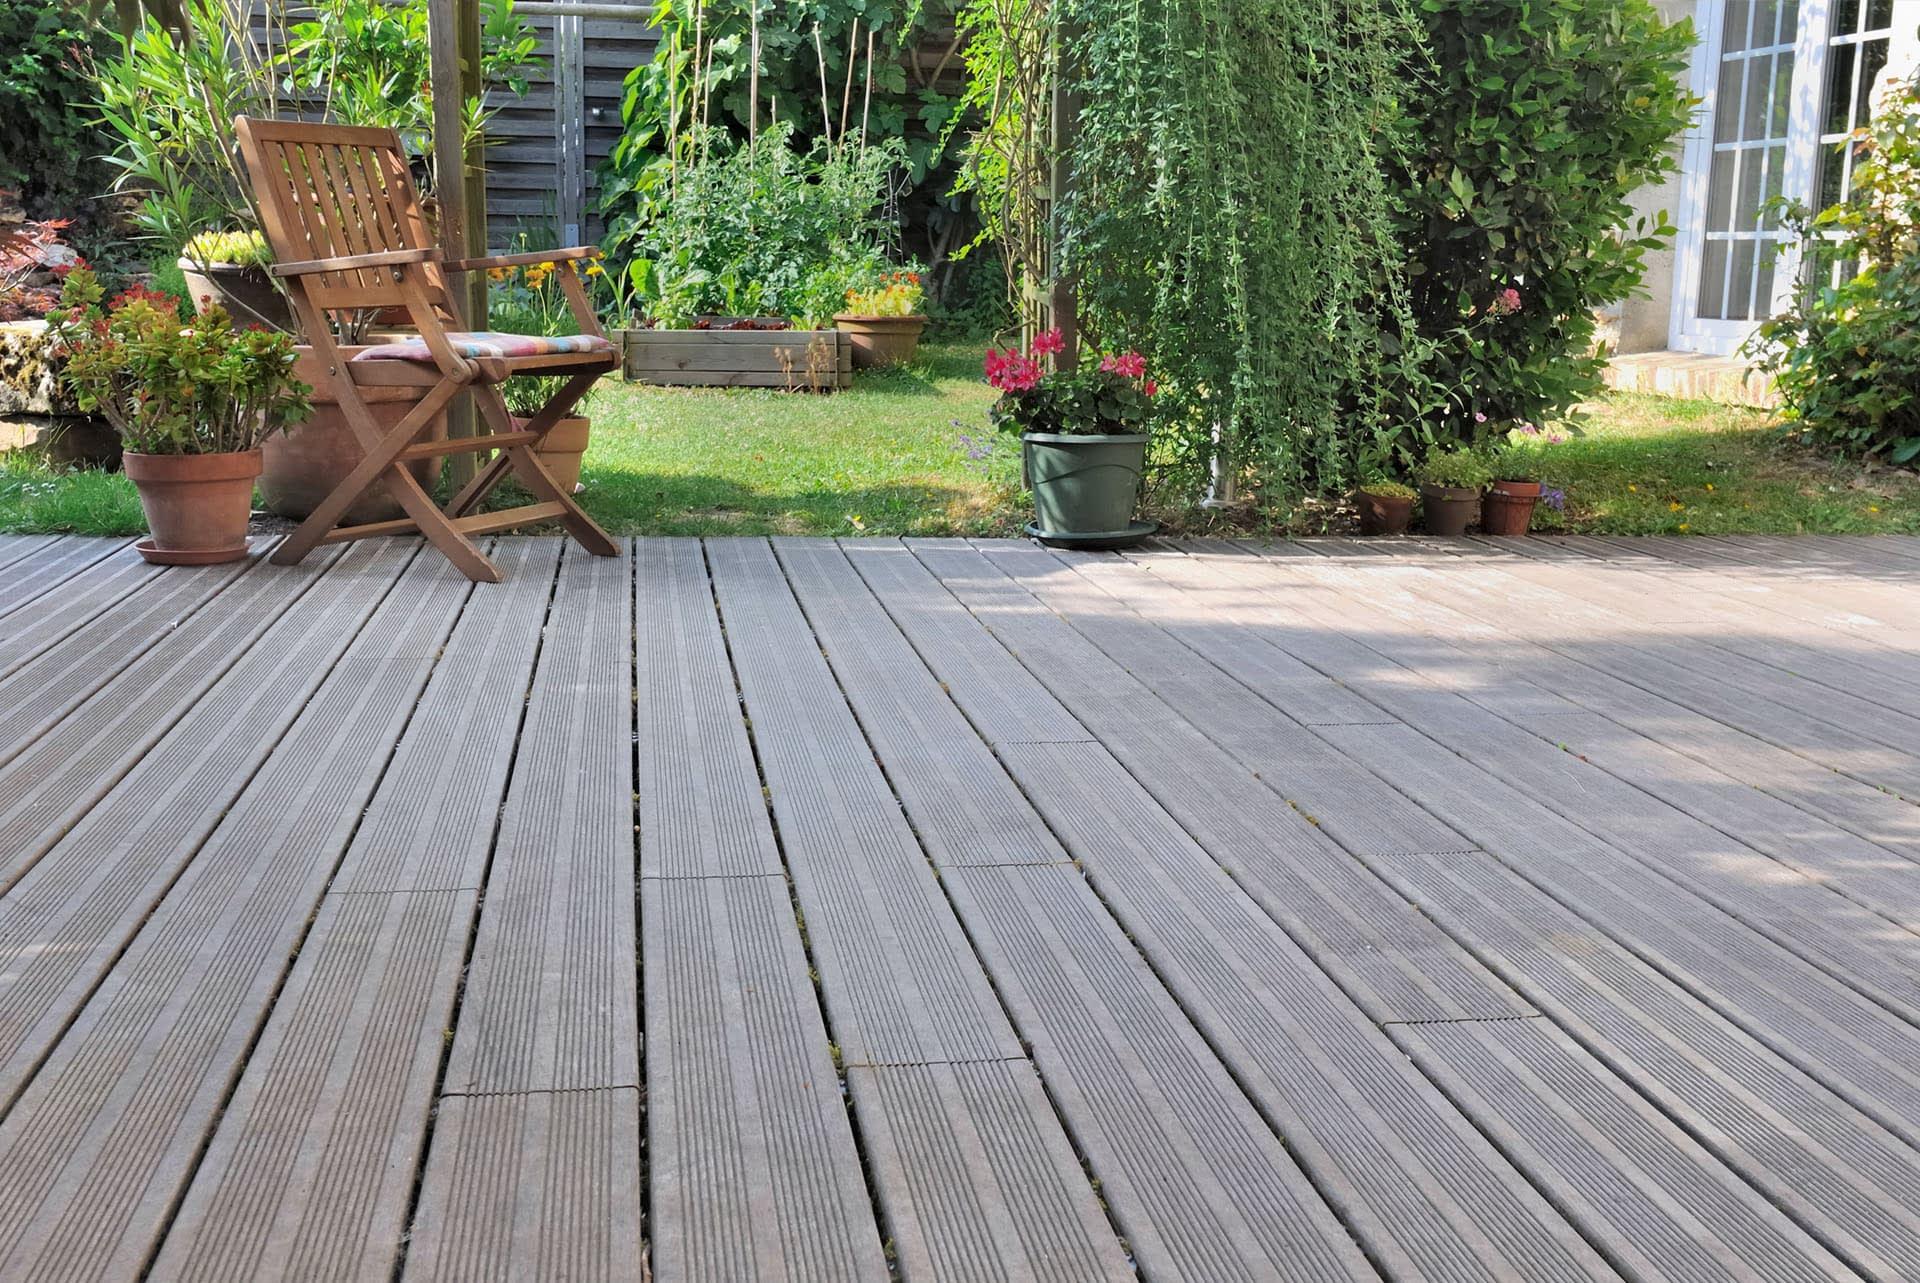 timber-decking-wooden-deck-boards-natural-grey-garden-patio